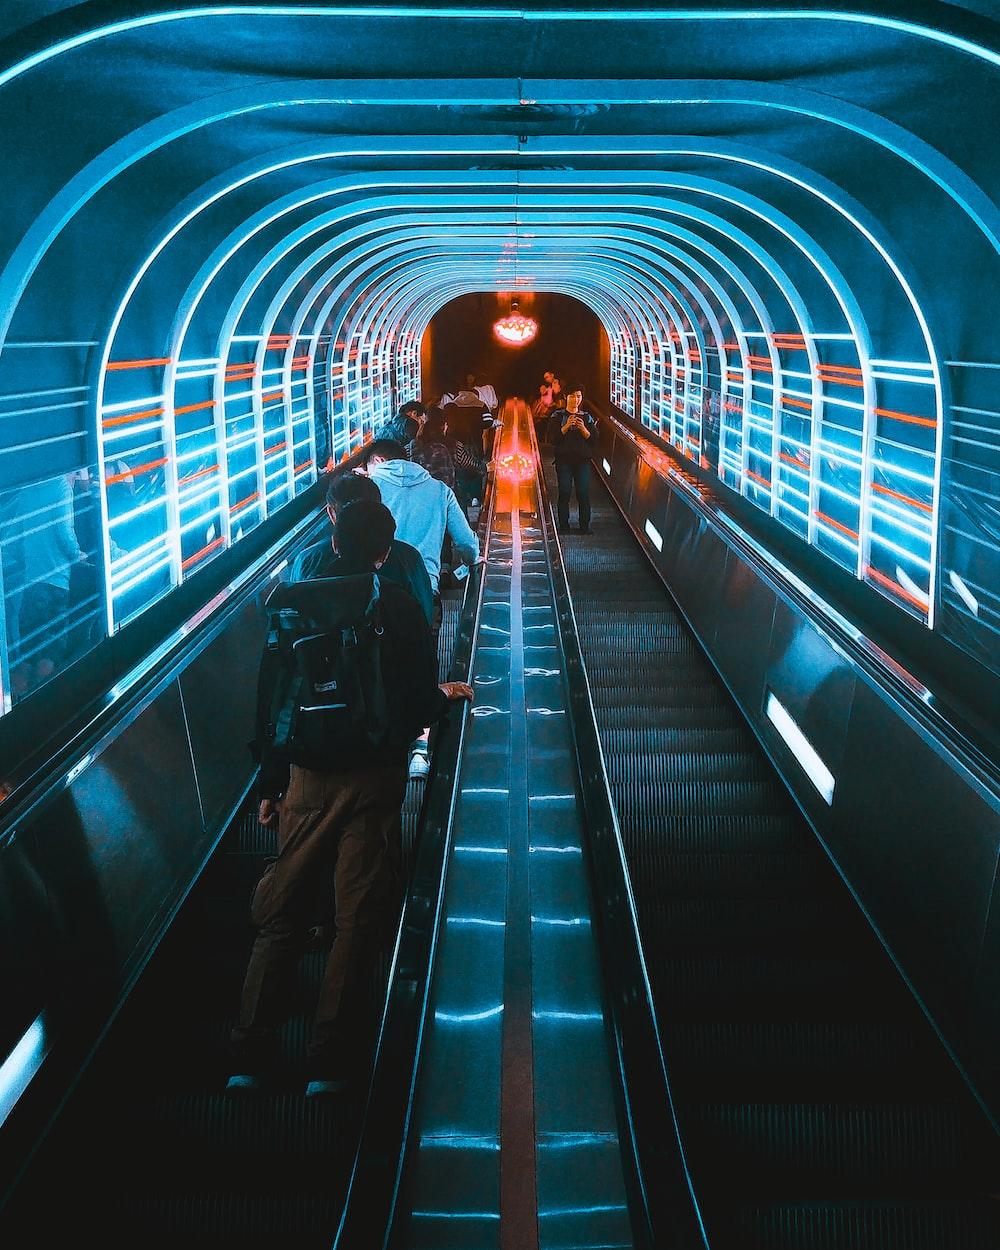 photo of people using escalators under blue LED lights